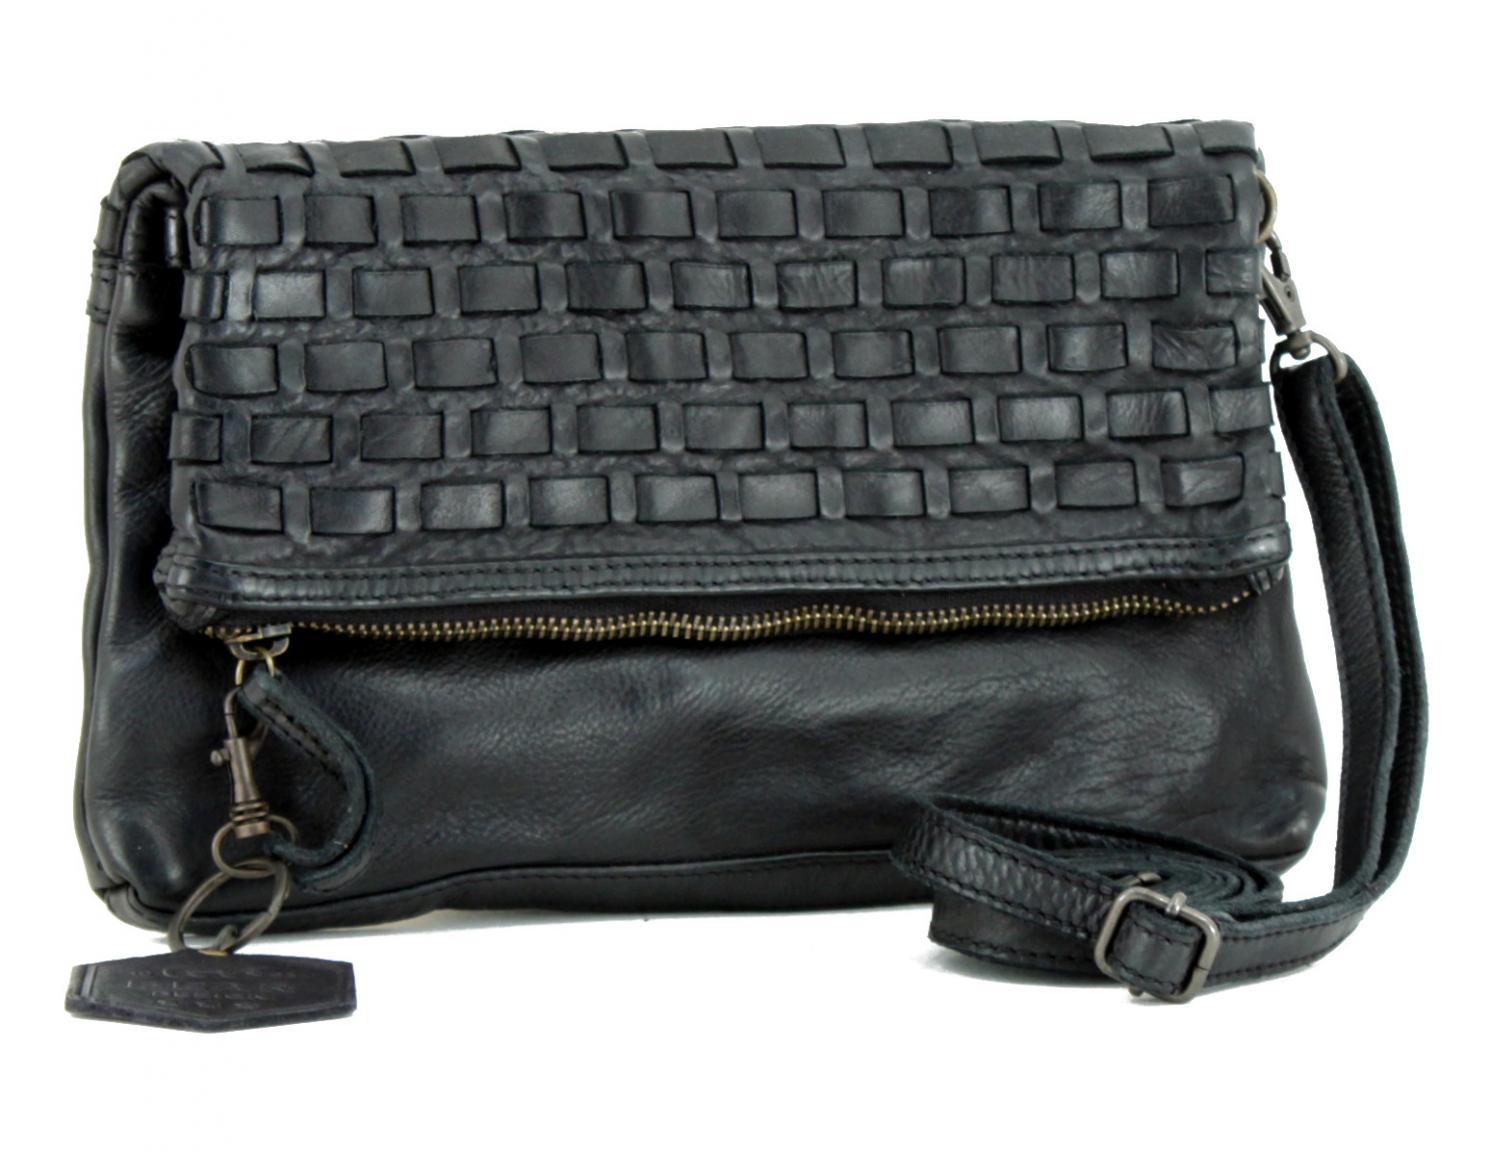 geflochtene Ledertasche Bear Bags New Woven schwarz Vintage